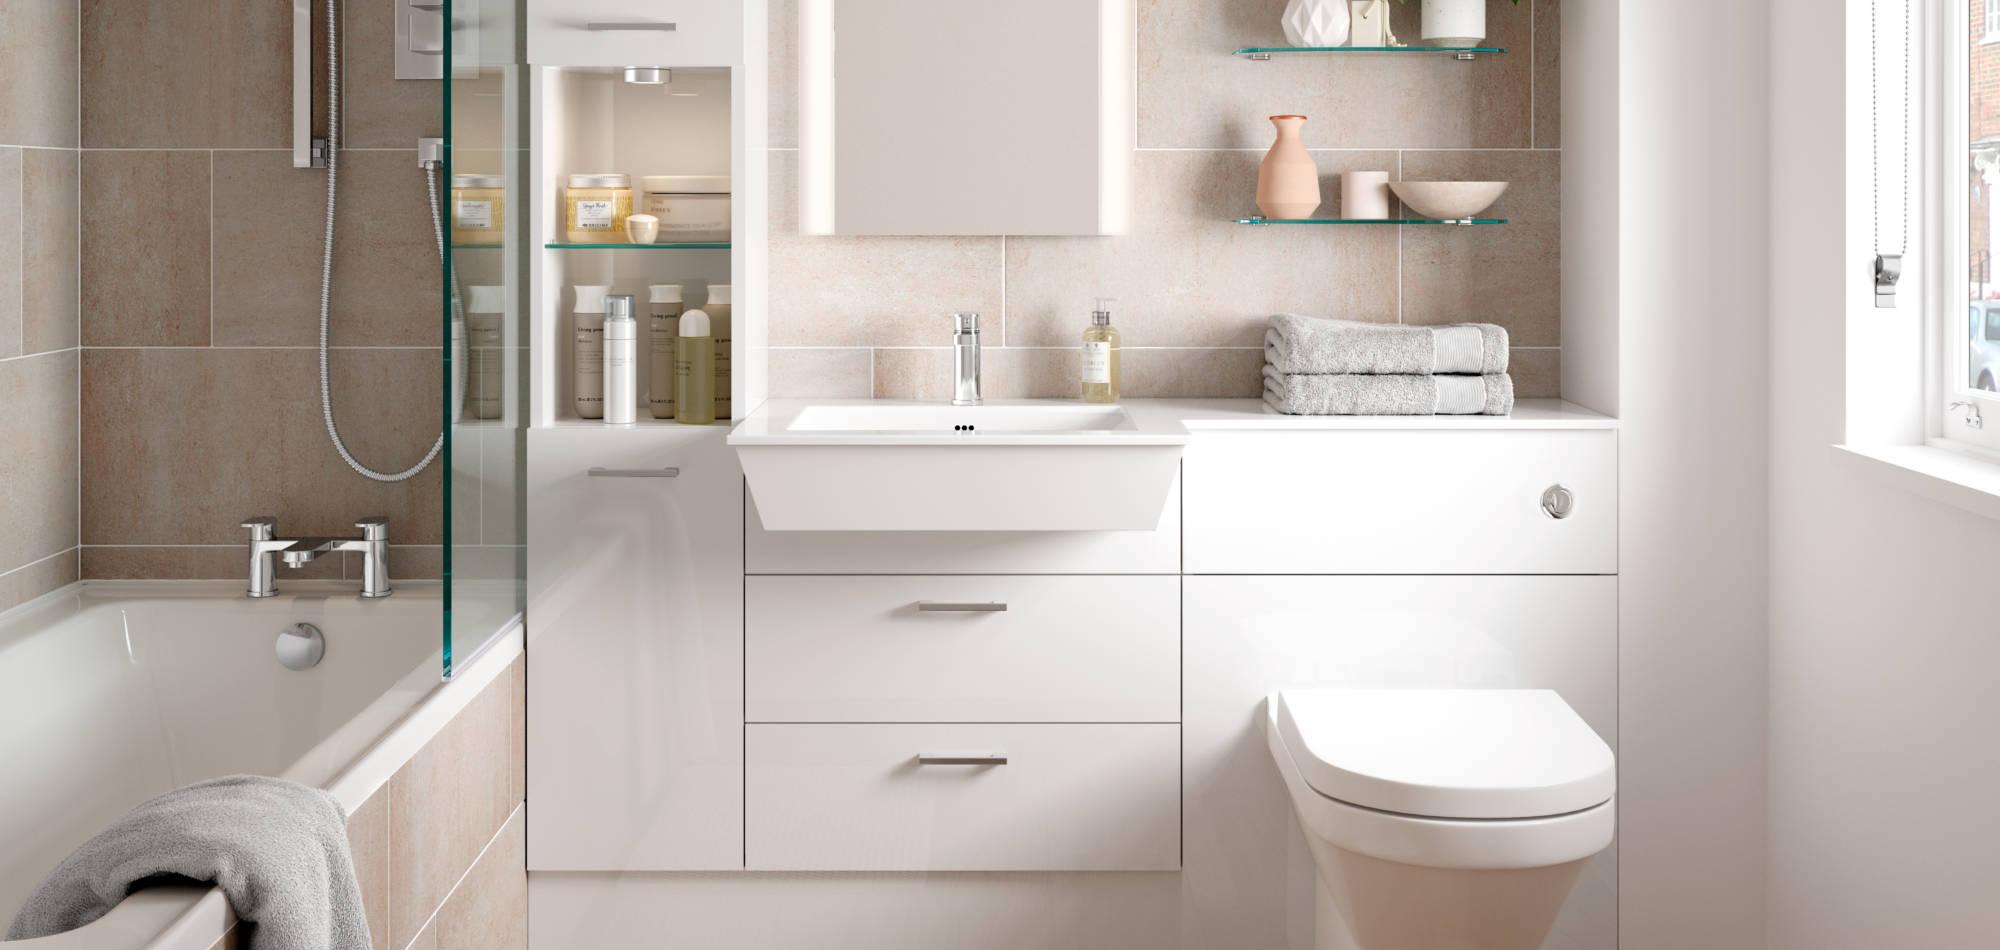 mereway bathrooms adriatic white gloss